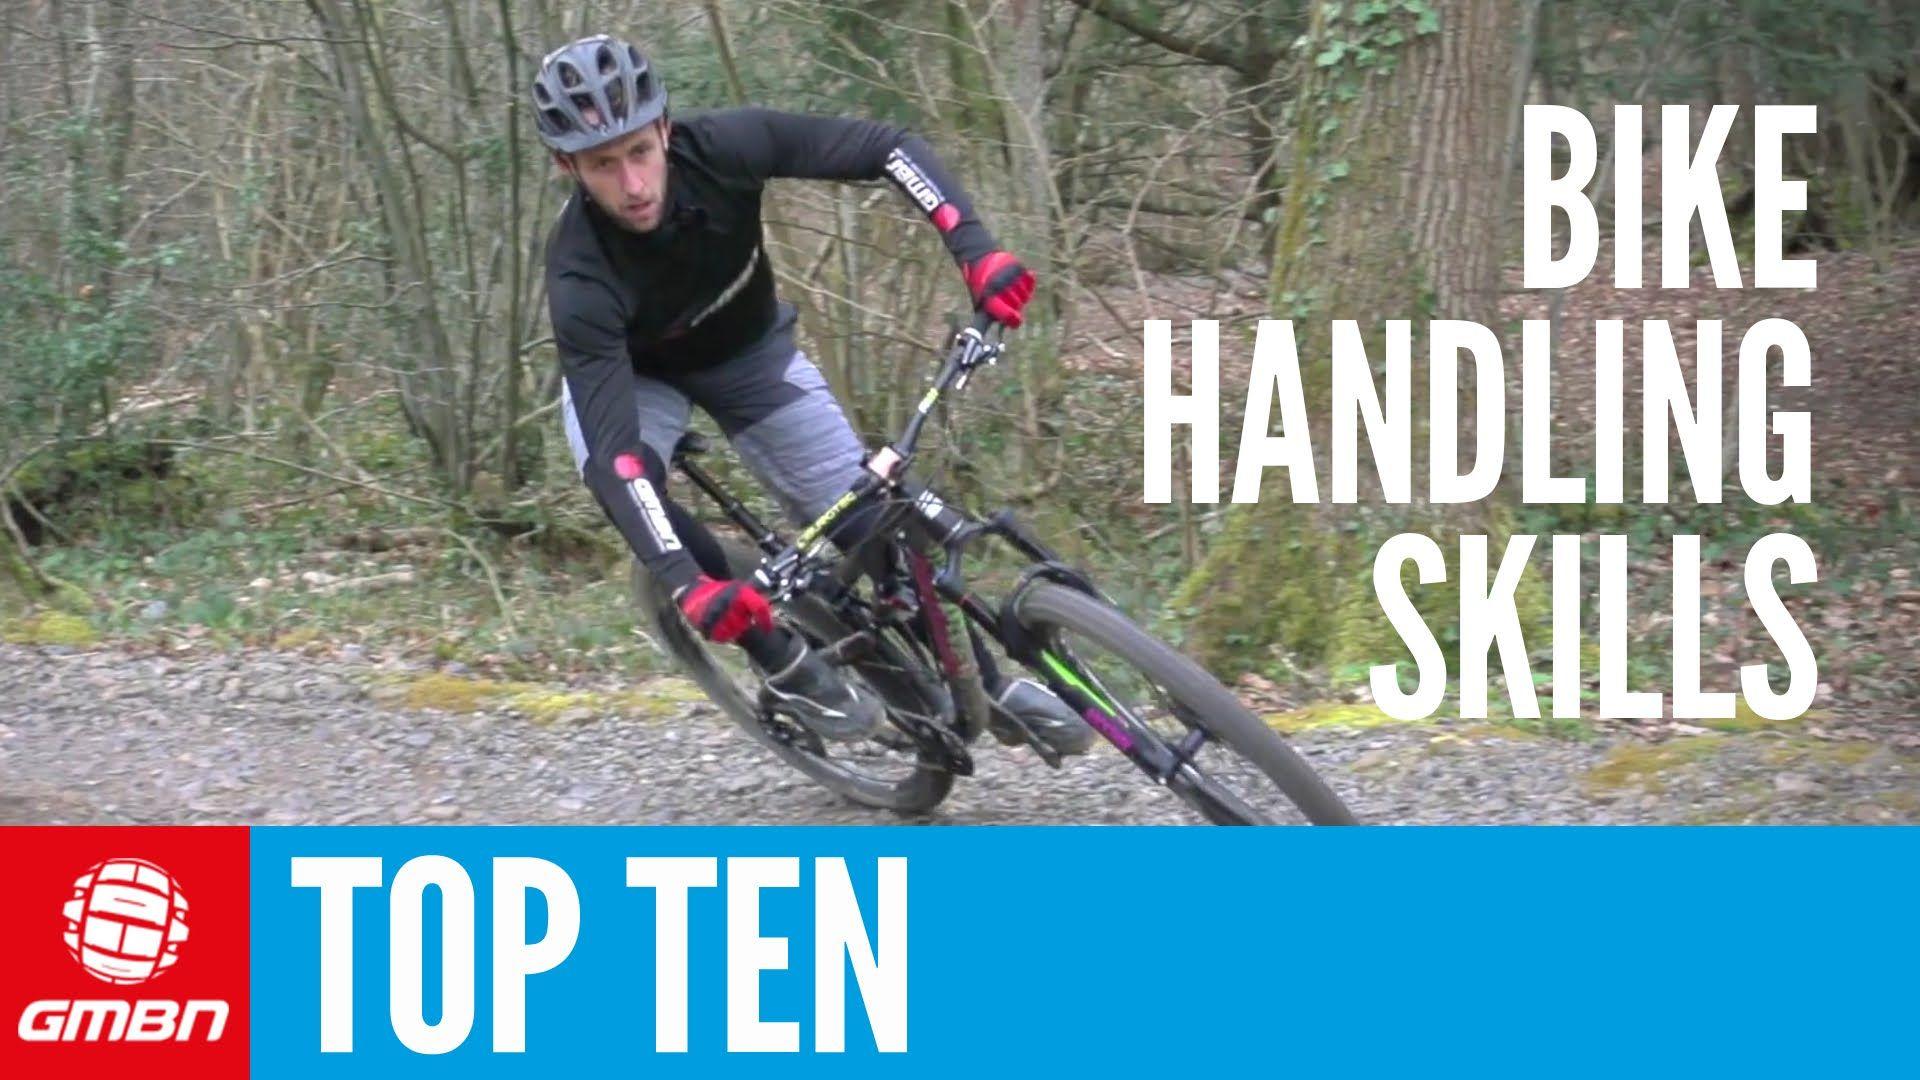 Top 10 Essential Mtb Skills Ten Mountain Bike Handling Tips